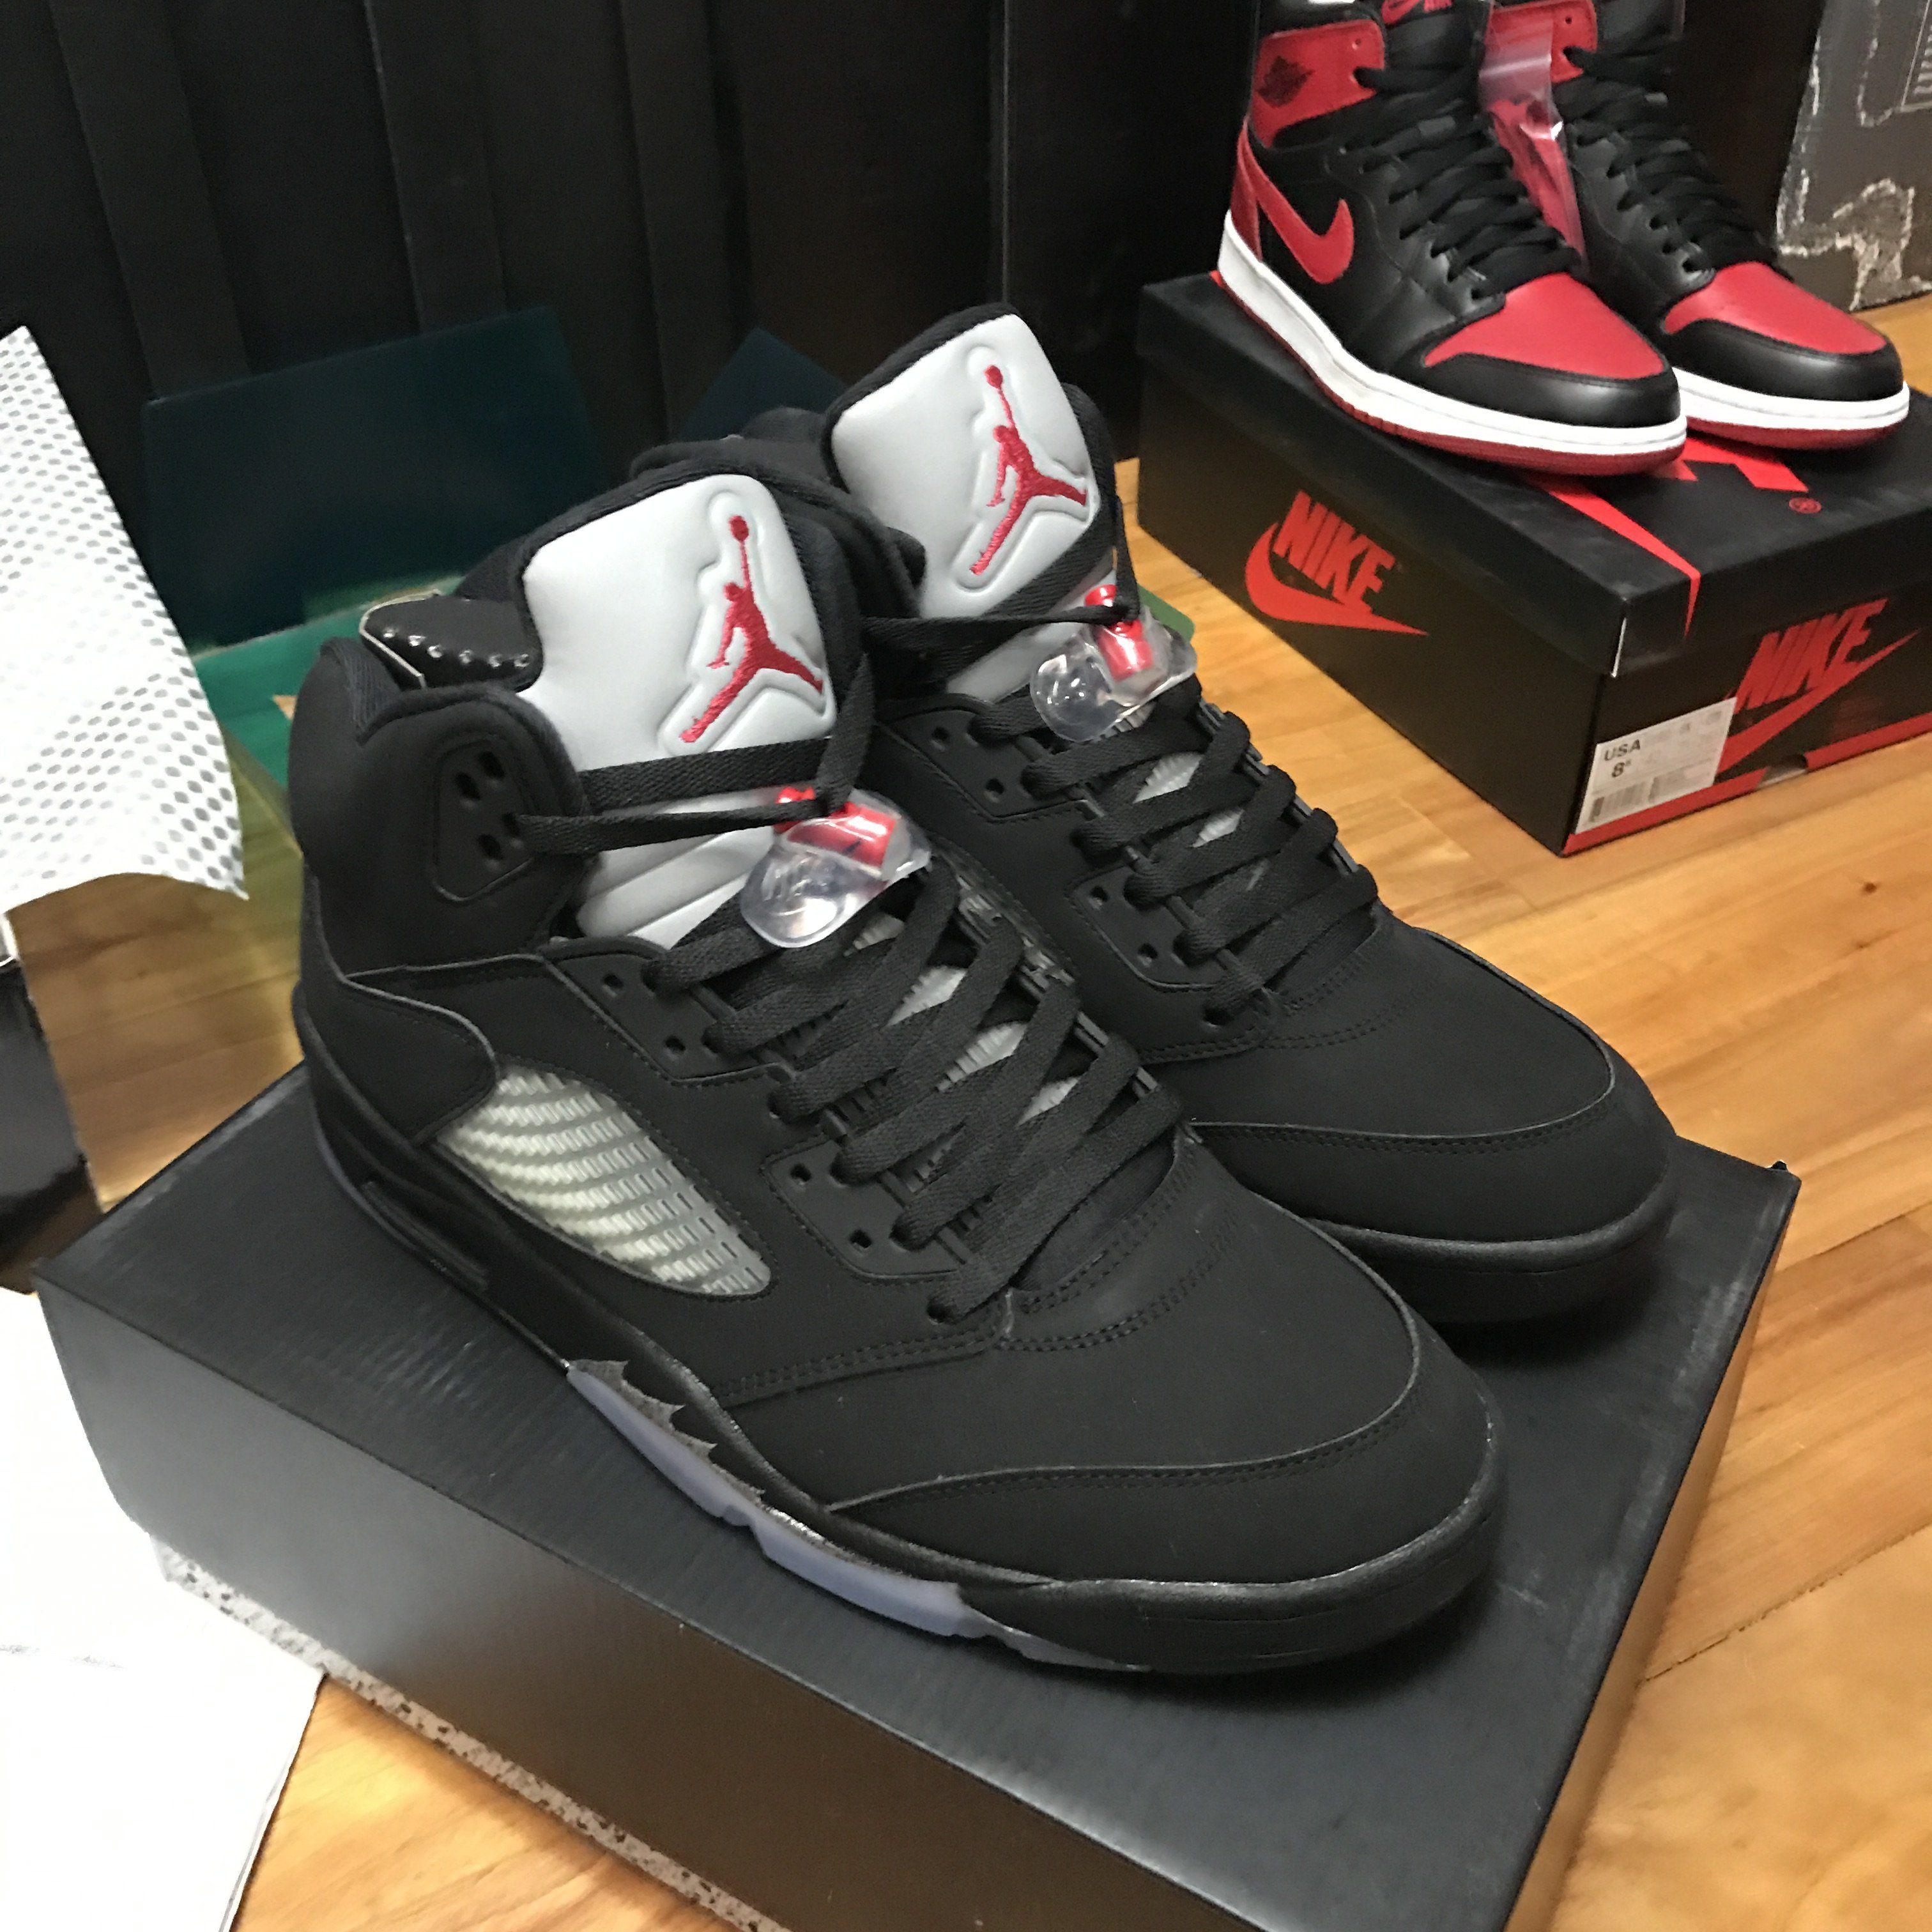 half off 5616d bede3 Jordan 5 Retro Black Metallic (2016) 845035-003